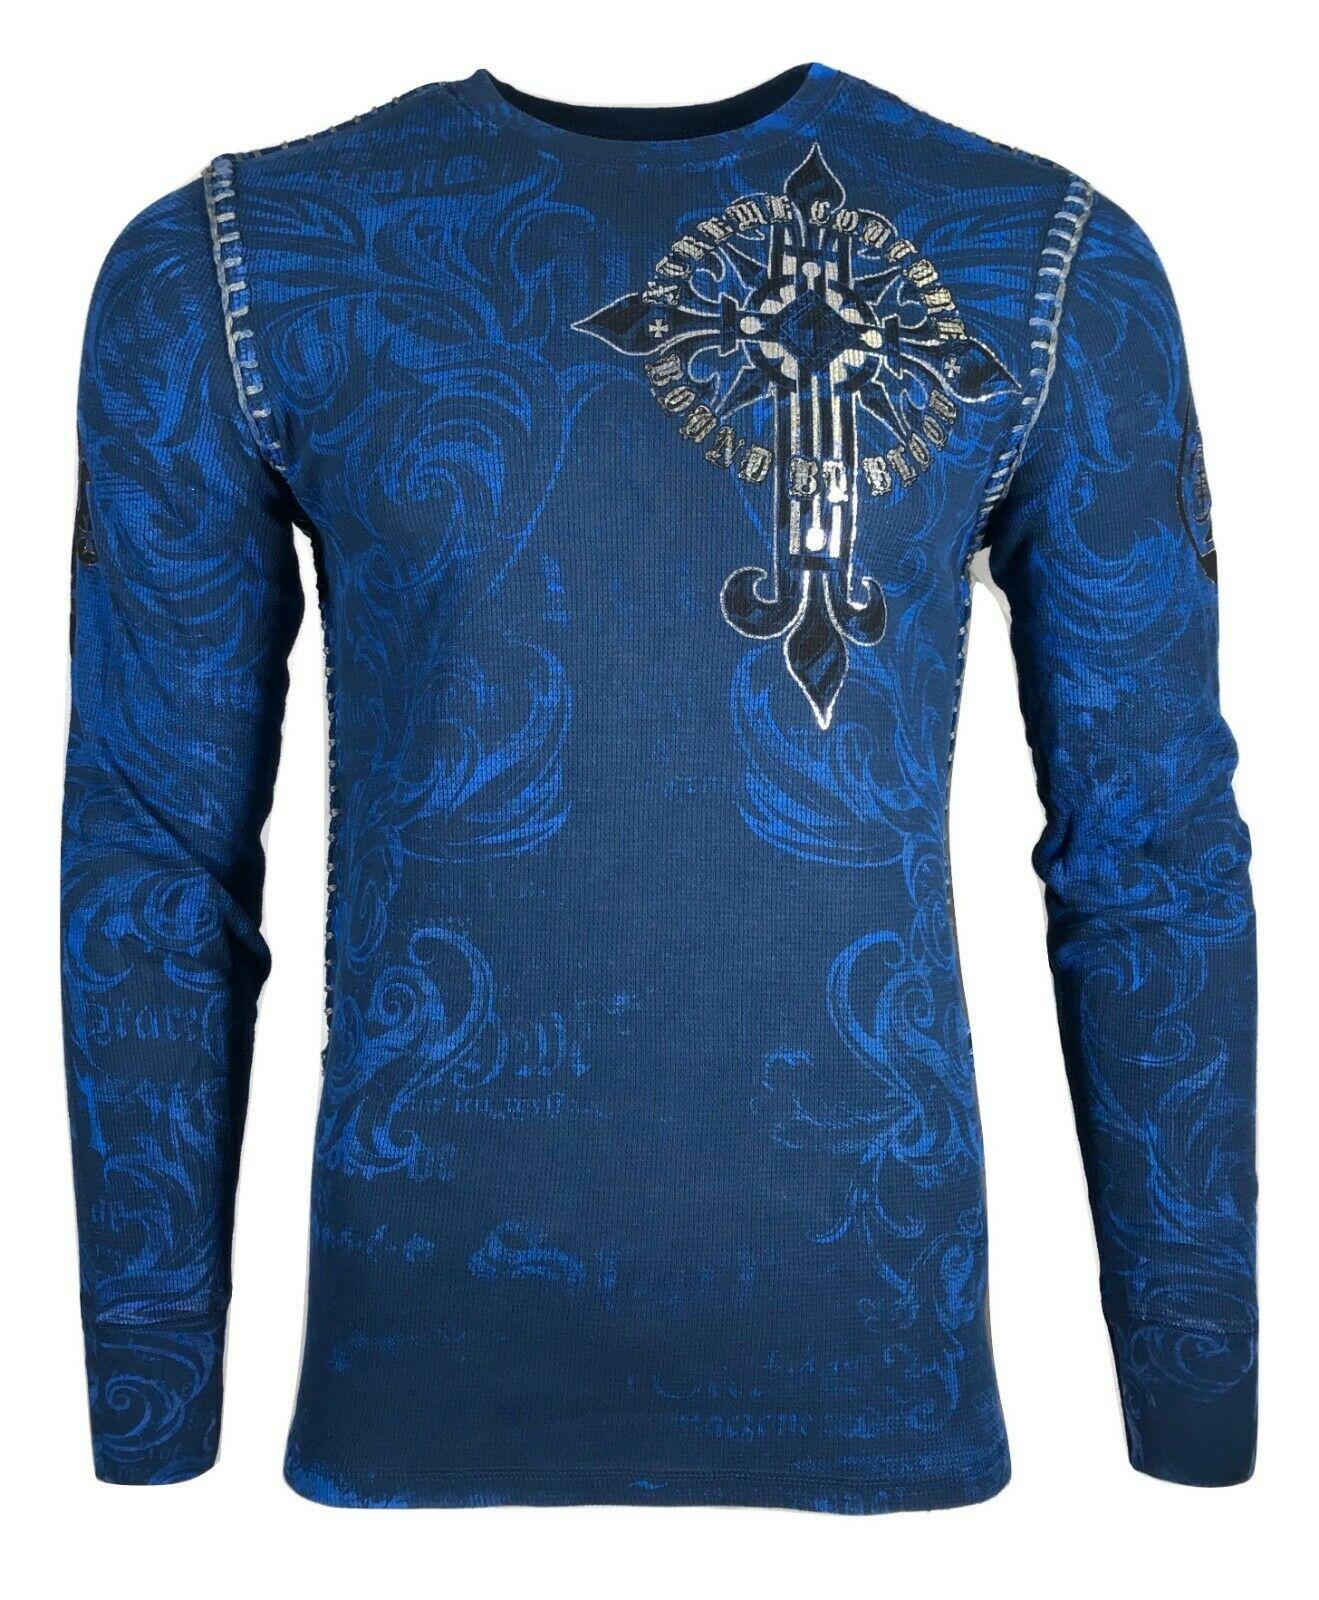 Xtreme Couture AFFLICTION Men THERMAL T-Shirt TELEPHUS Skull Biker UFC S-3XL $58